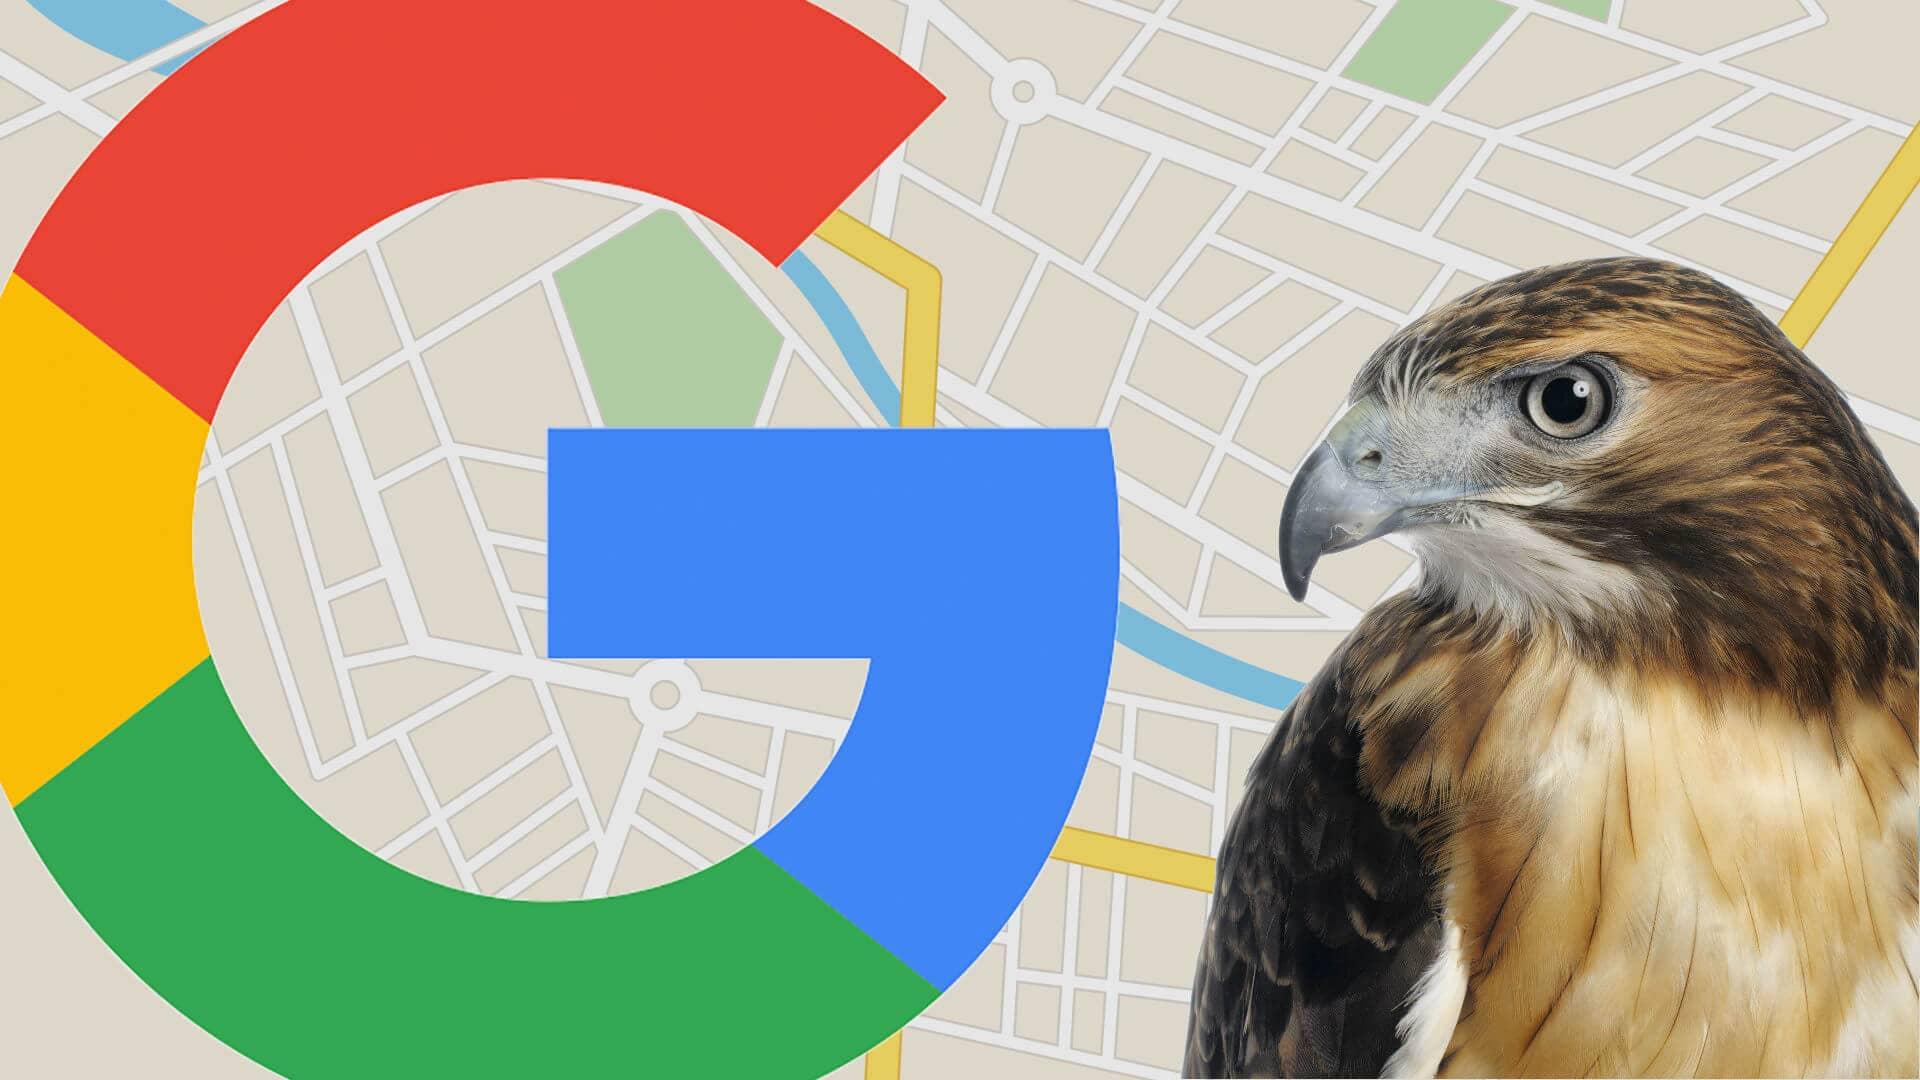 گوگل الگوریتم هاوک را عرضه نمود